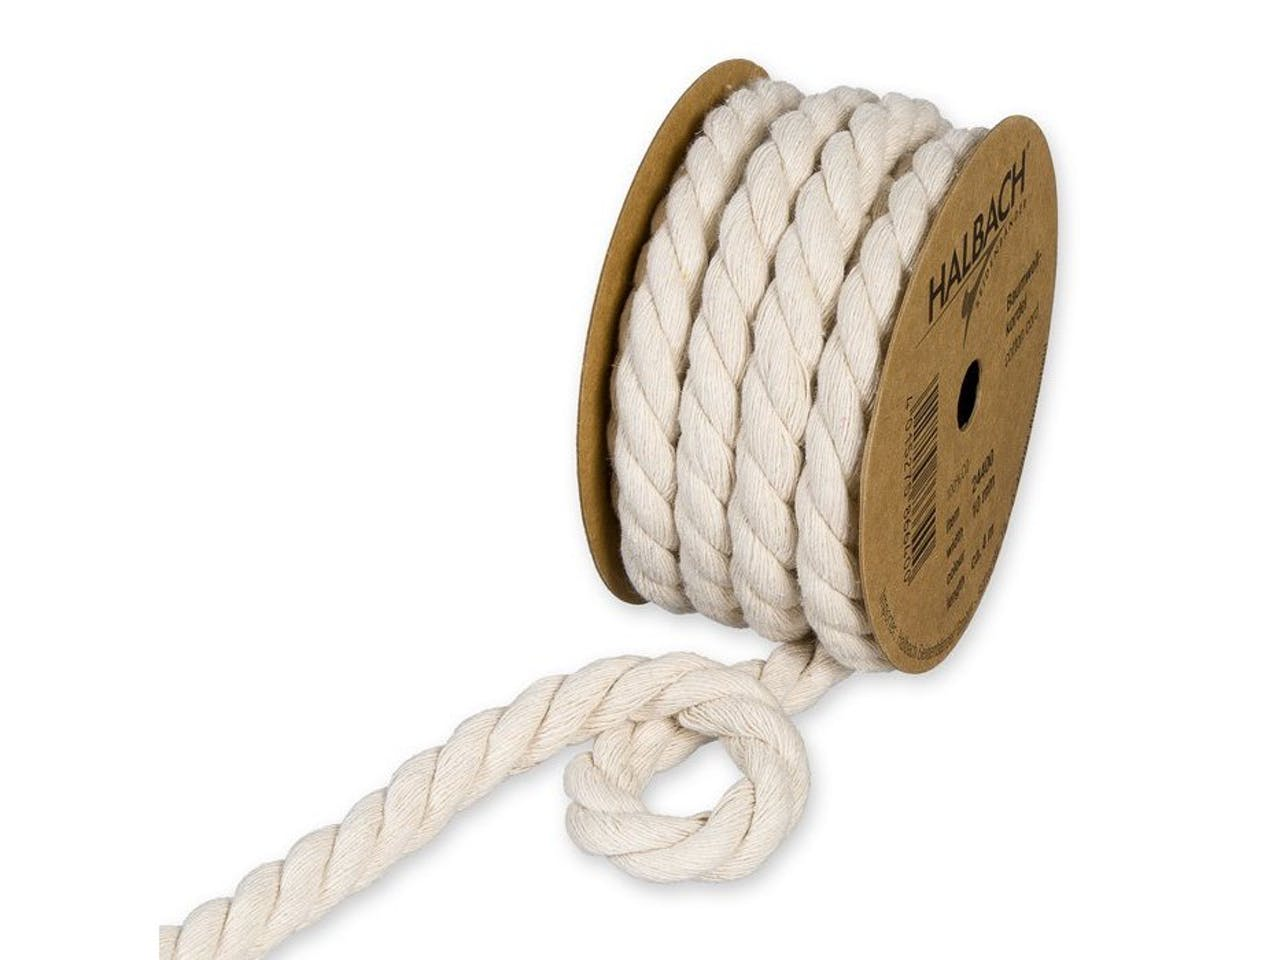 Recycling Baumwollrundkordel, gedreht, Spule, ø 10 mm, l = 4 m, naturweiß (70)